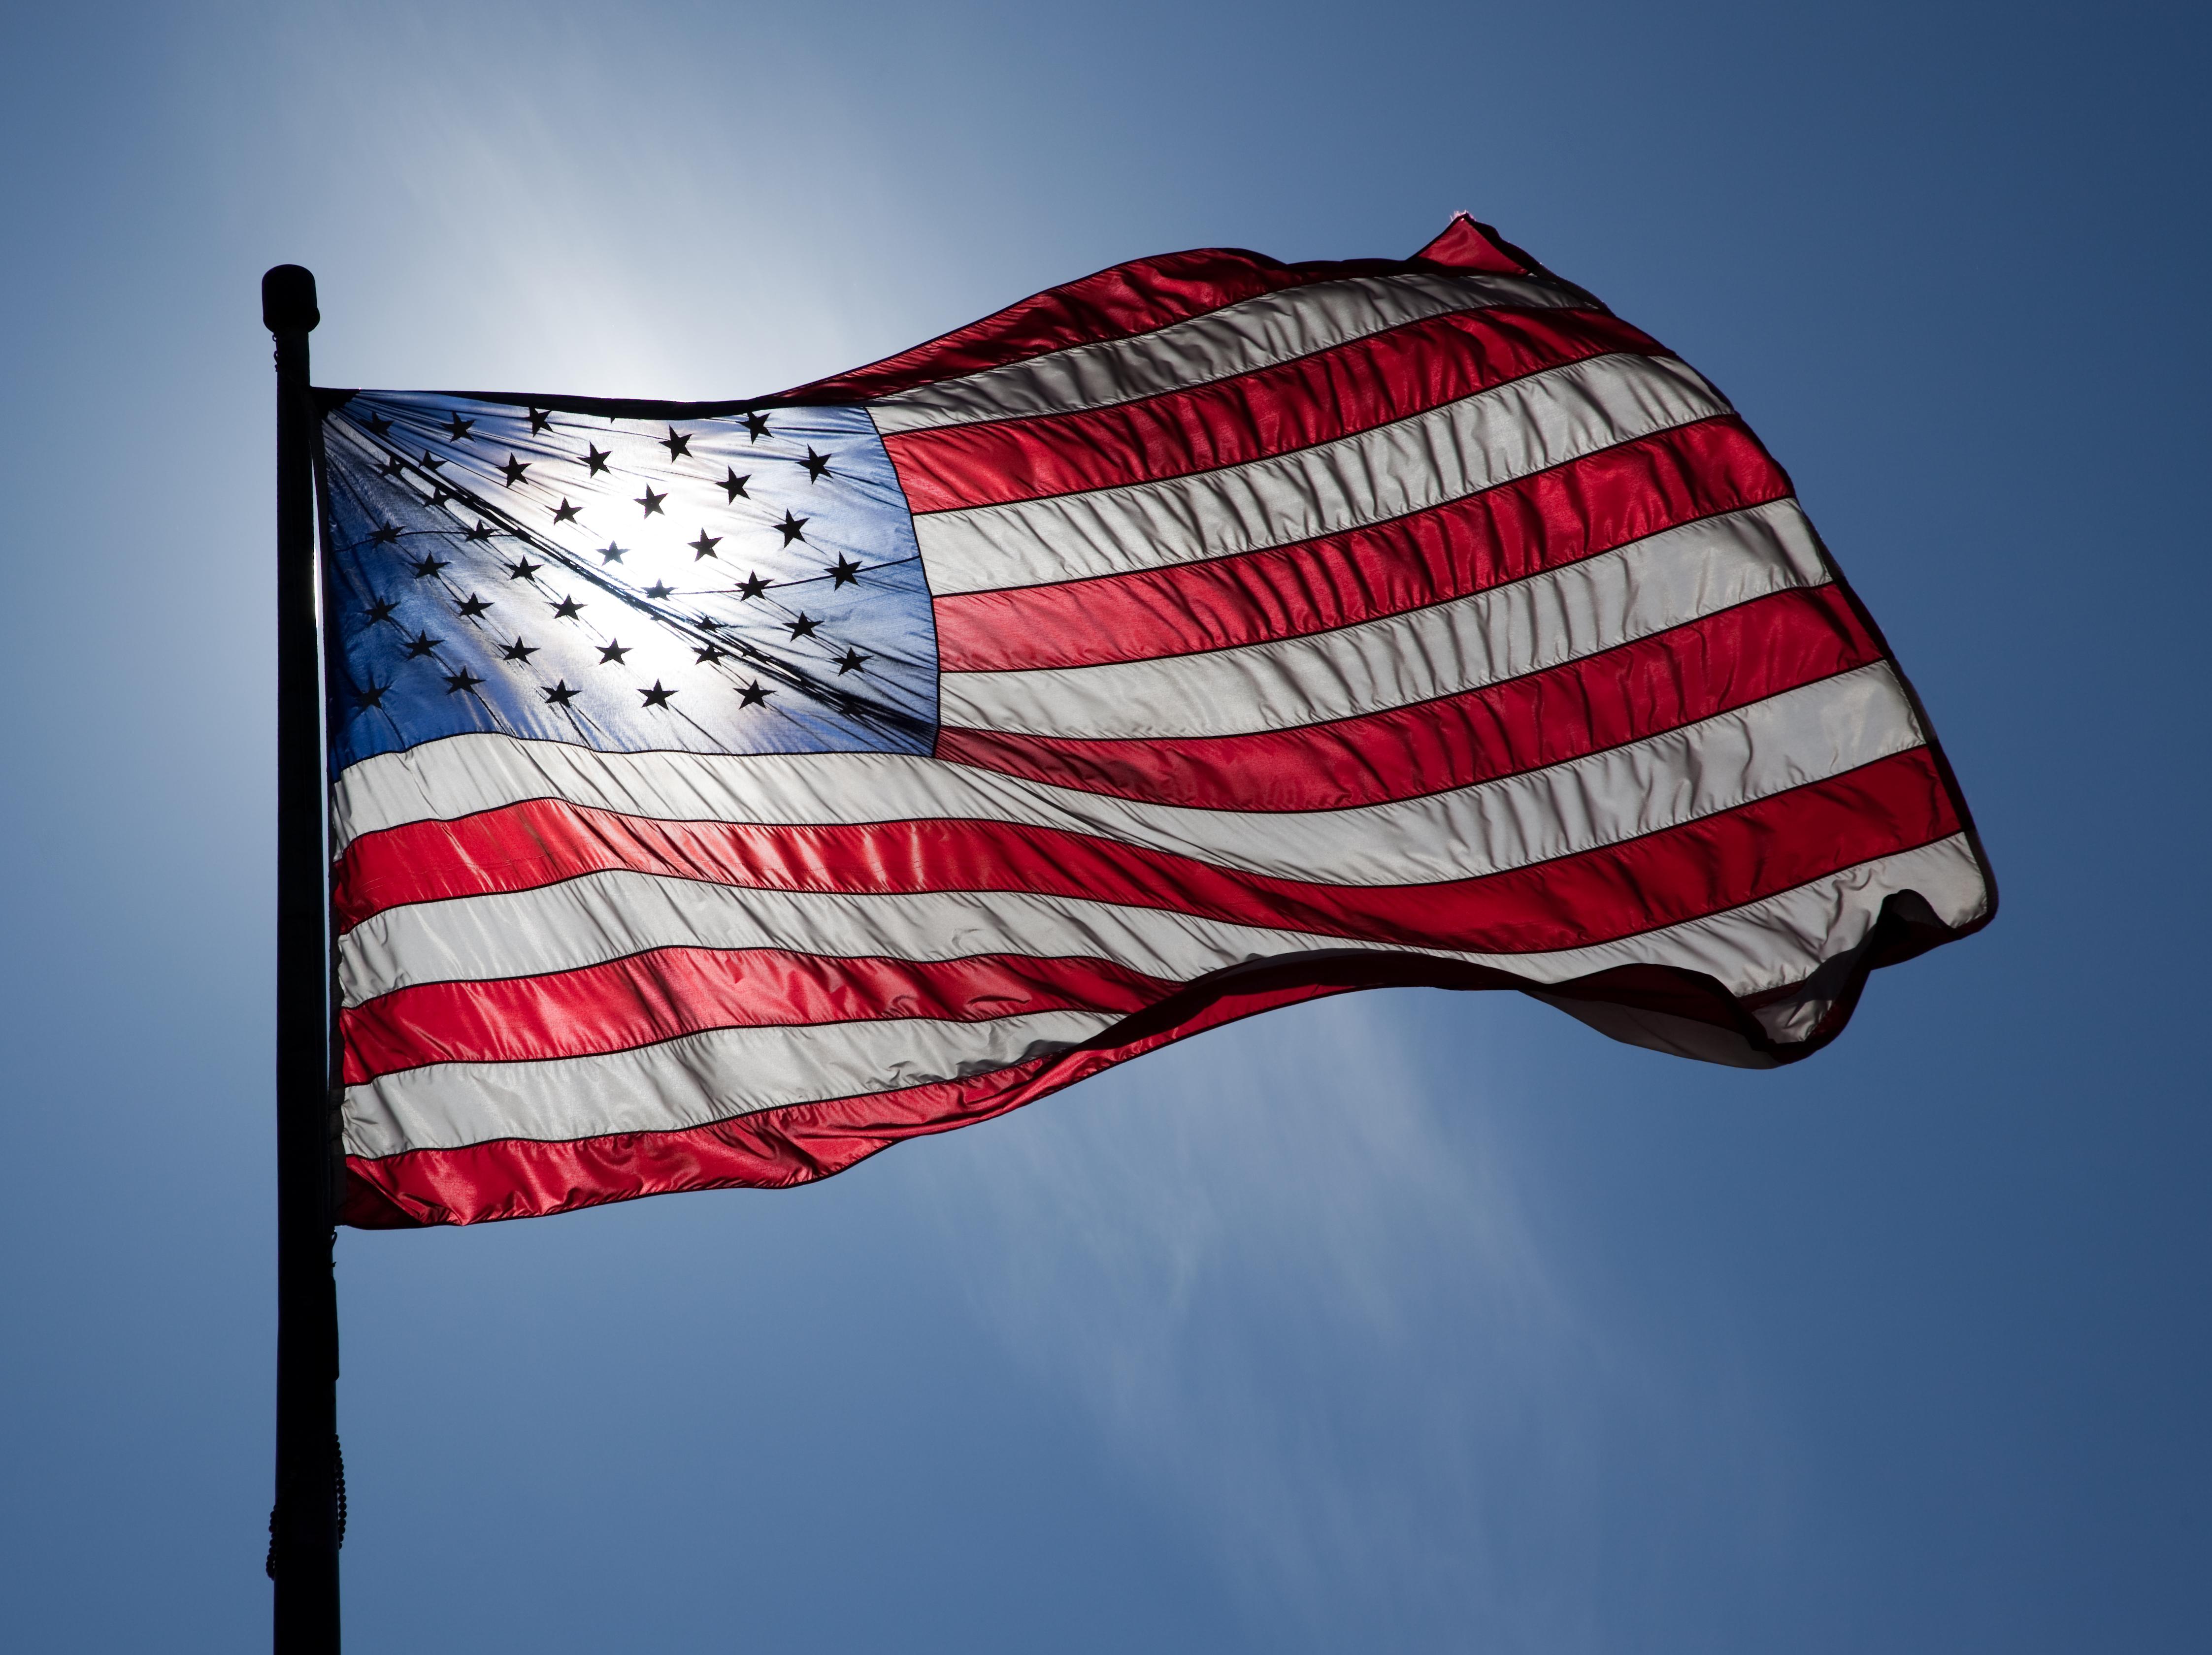 America Wallpaper download american flag hd 4k wallpapers in 2048x1152 screen resolution